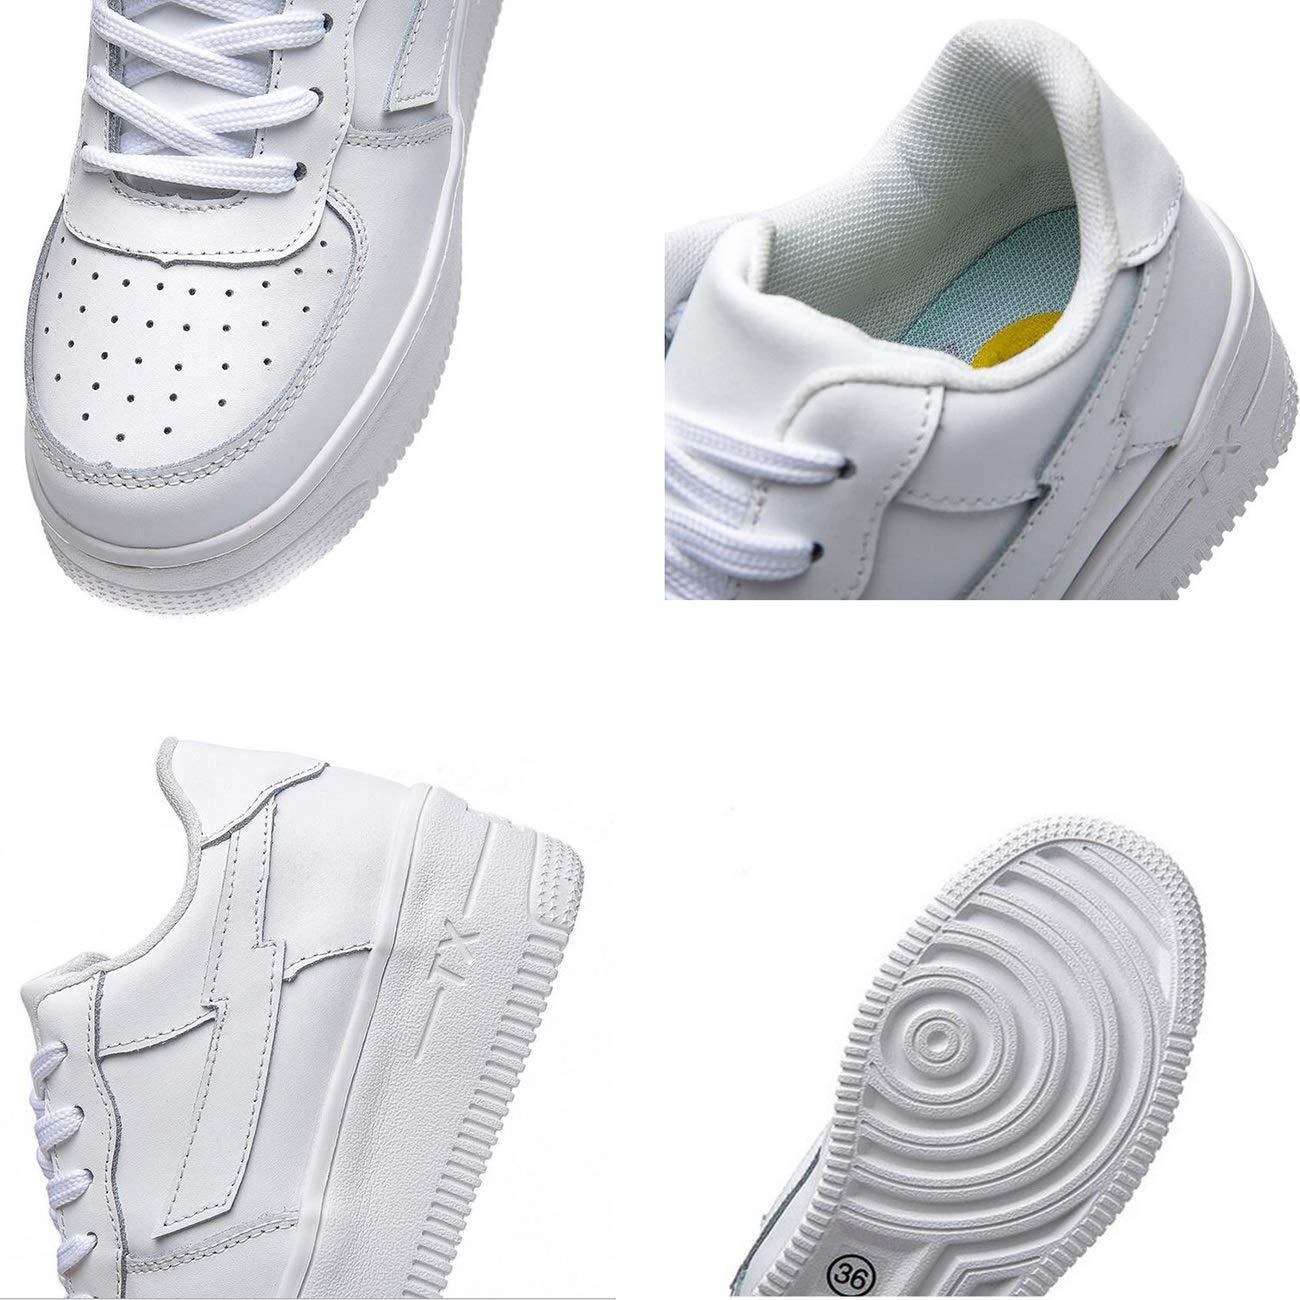 Hy Damen Freizeitschuhe Leder Frühjahr Herbst-Komfort-Turnschuhe dicken Boden erhöhen erhöhen erhöhen Mode einzelne Schuhe Damen Slip-Ons Lace-up Flache Loafers Wanderschuhe Größe  35-39 d29451